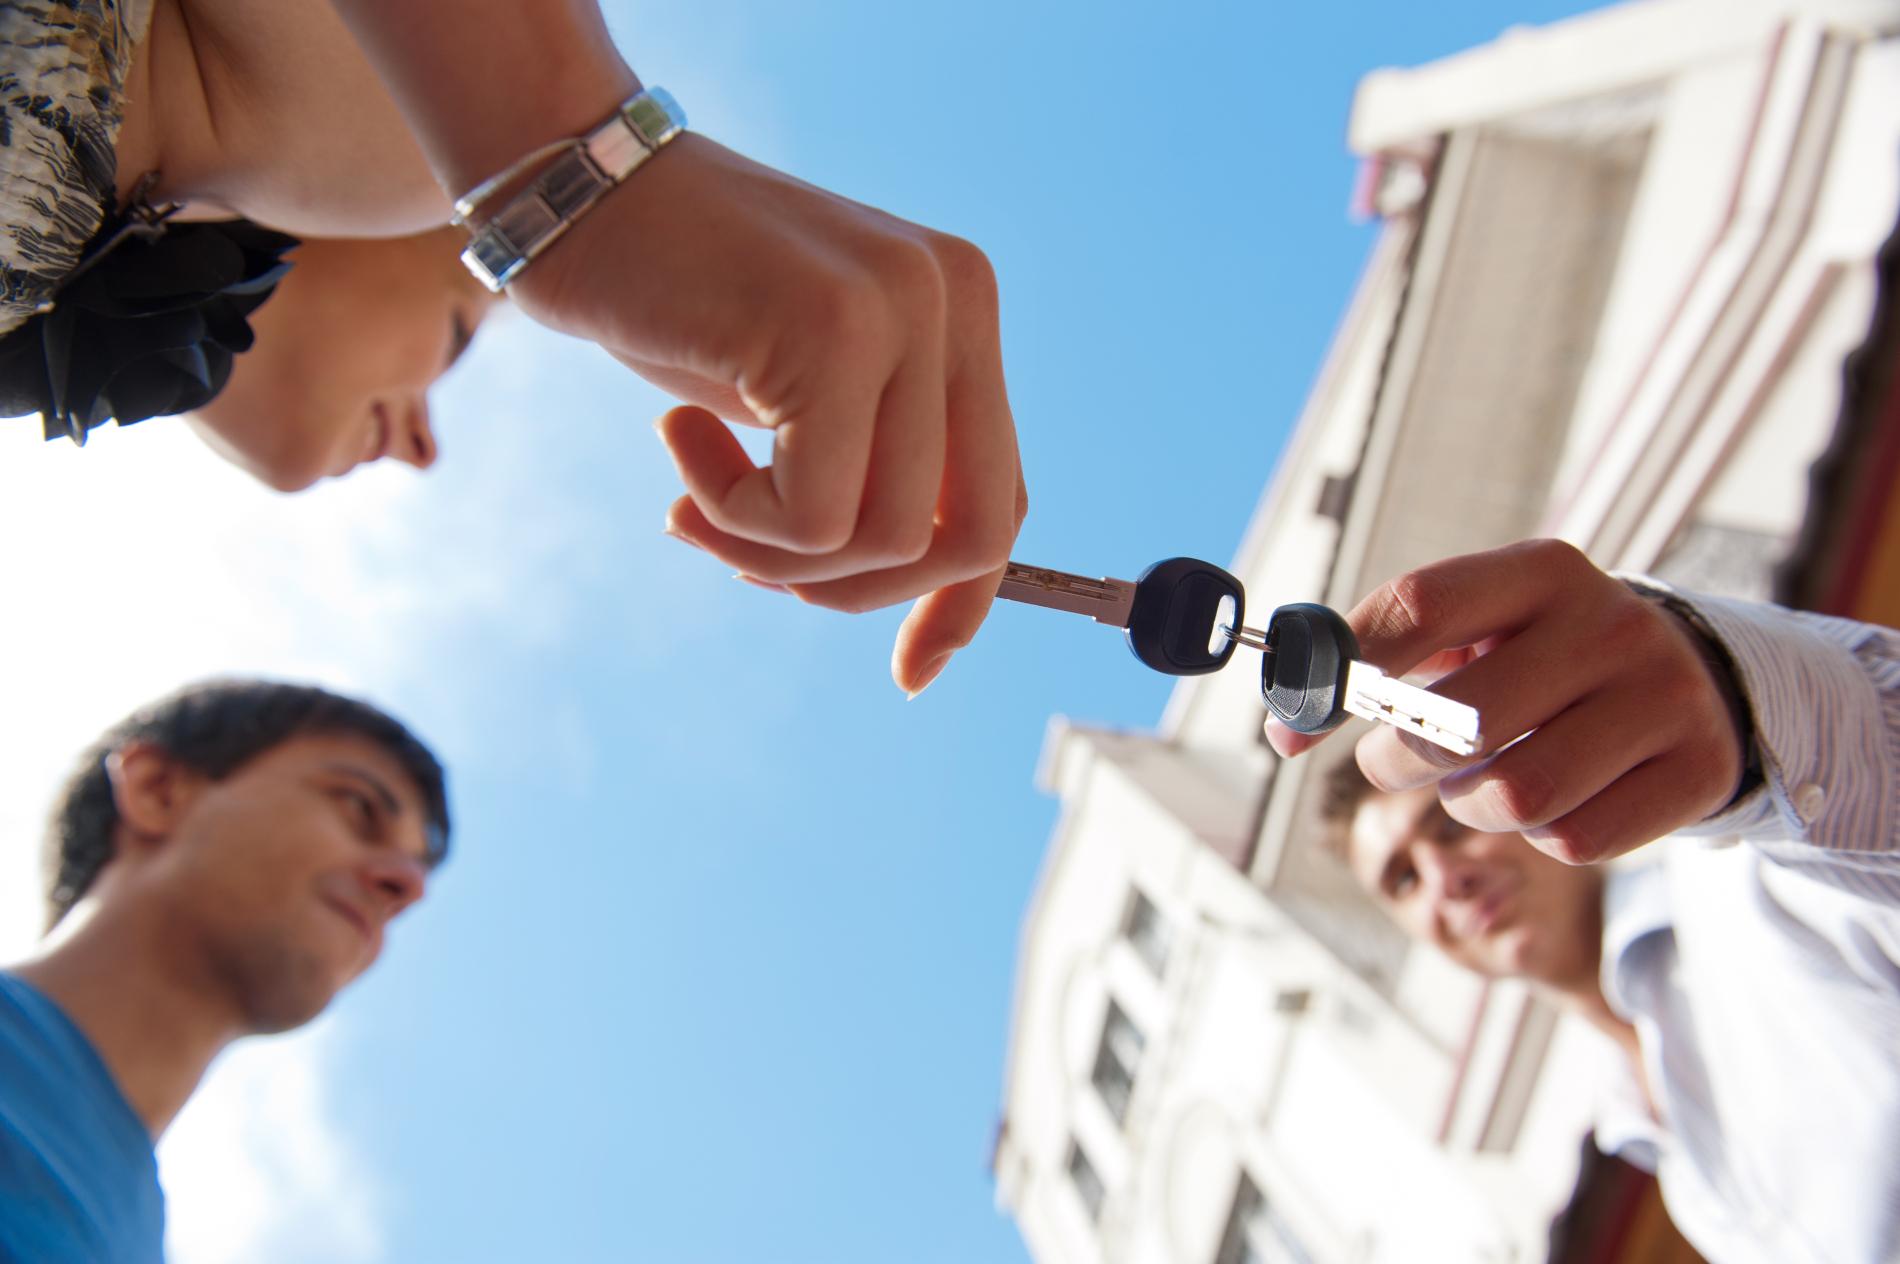 Gebouw-mensen-overhandiging-sleutel